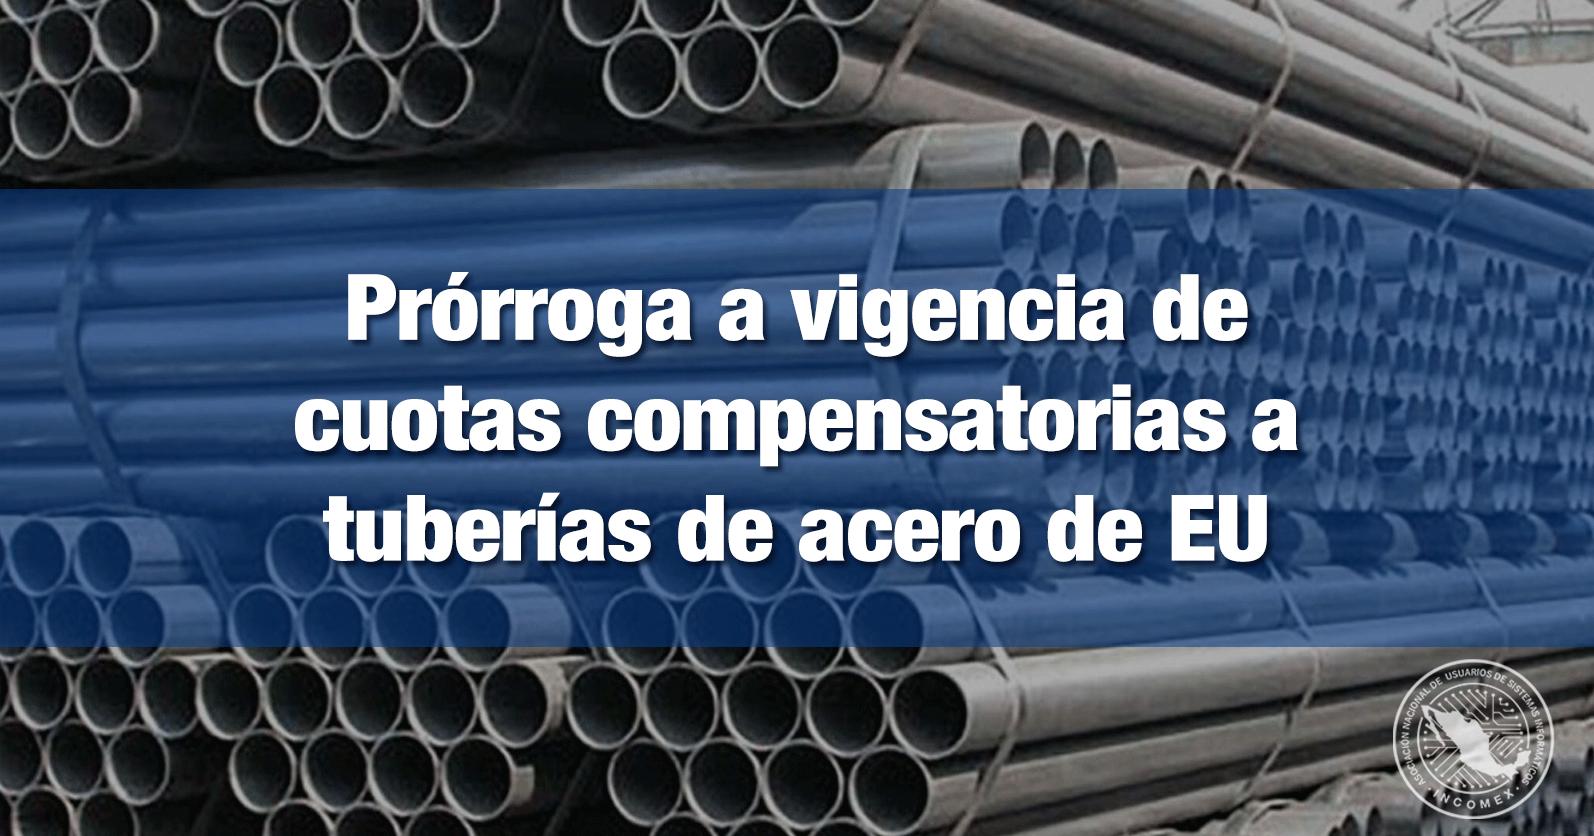 Prórroga a vigencia de cuotas compensatorias a tuberías de acero de EU